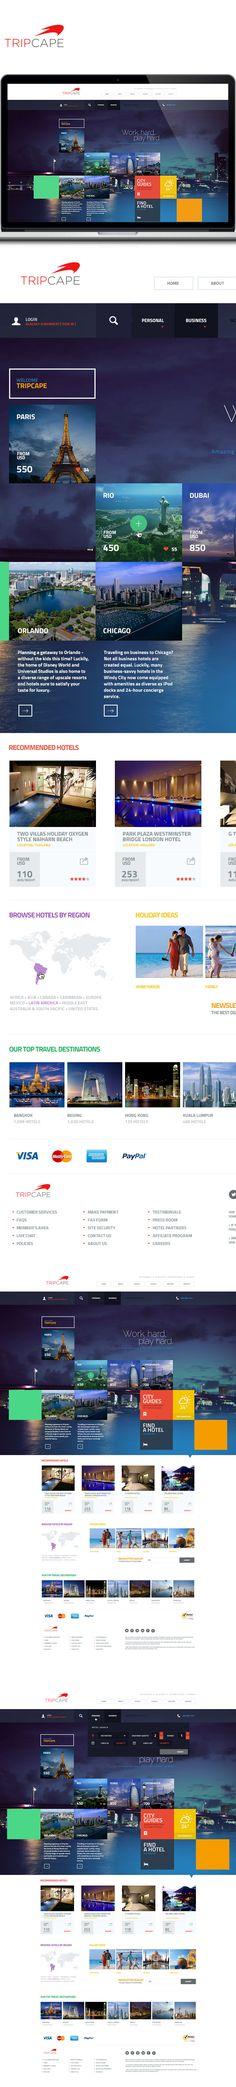 Tripcape on Behance #ui #mobile #design #ResponsiveDesign #Web #UI #UX #WordPress #Resposive Design #Website #Graphics